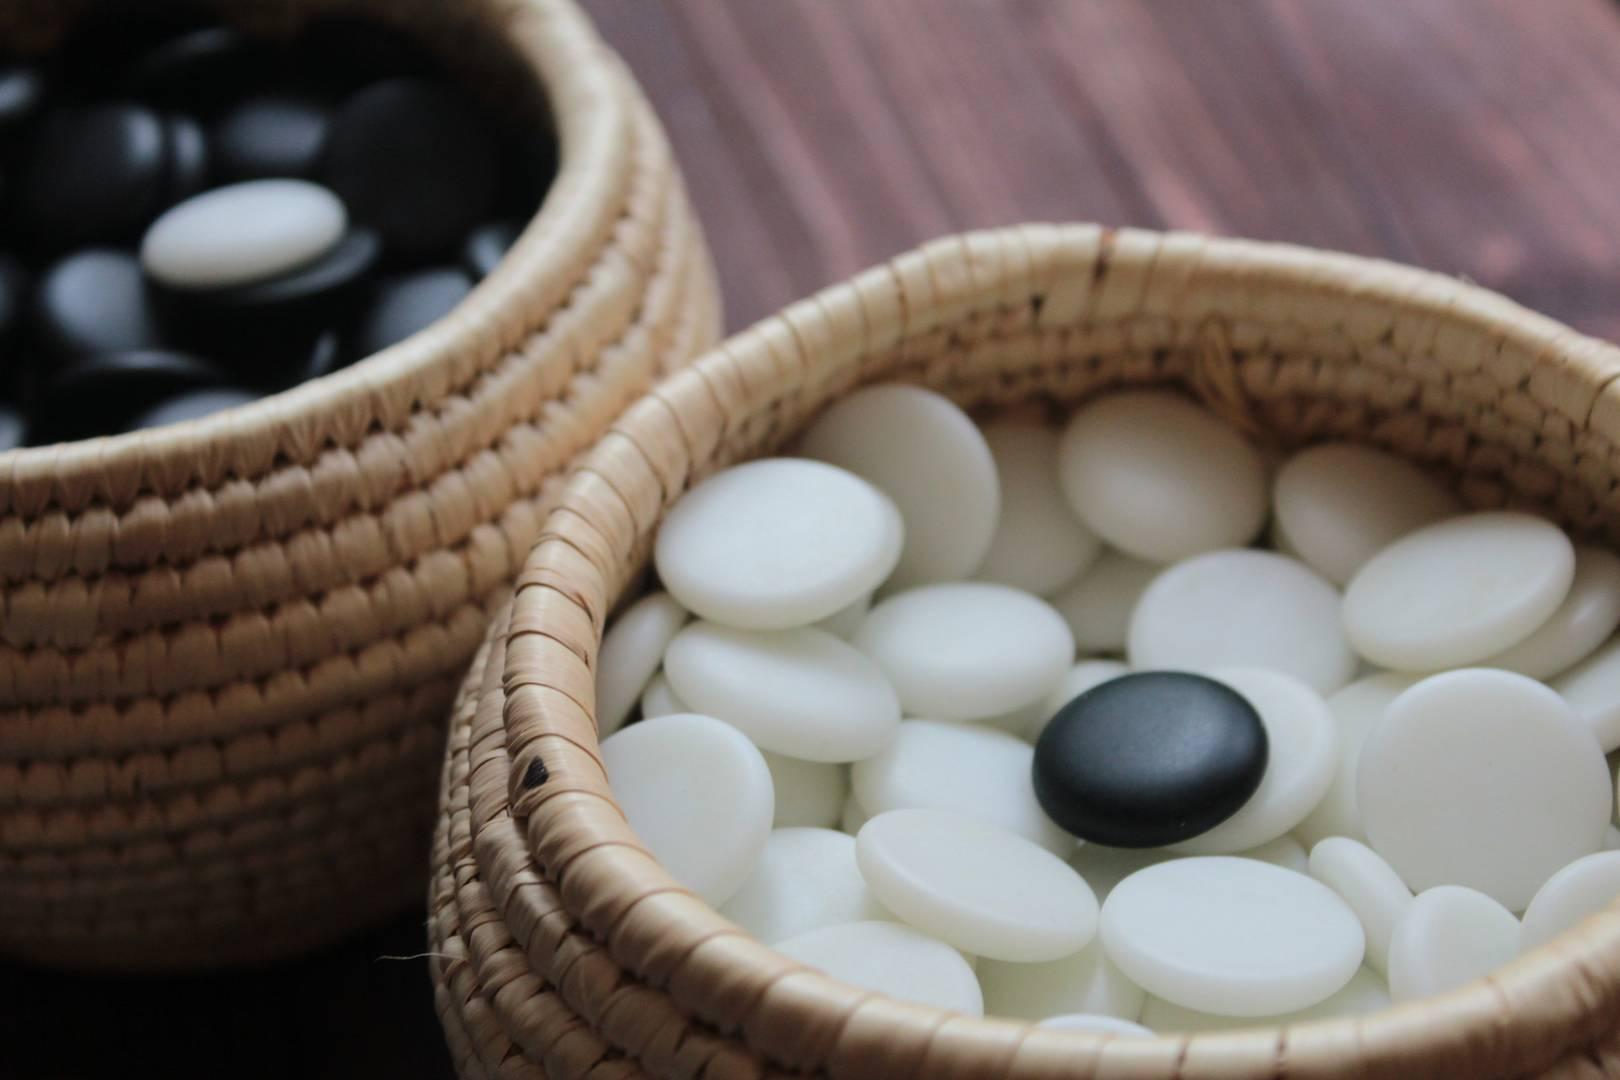 Чаши с китайскими камнями для го